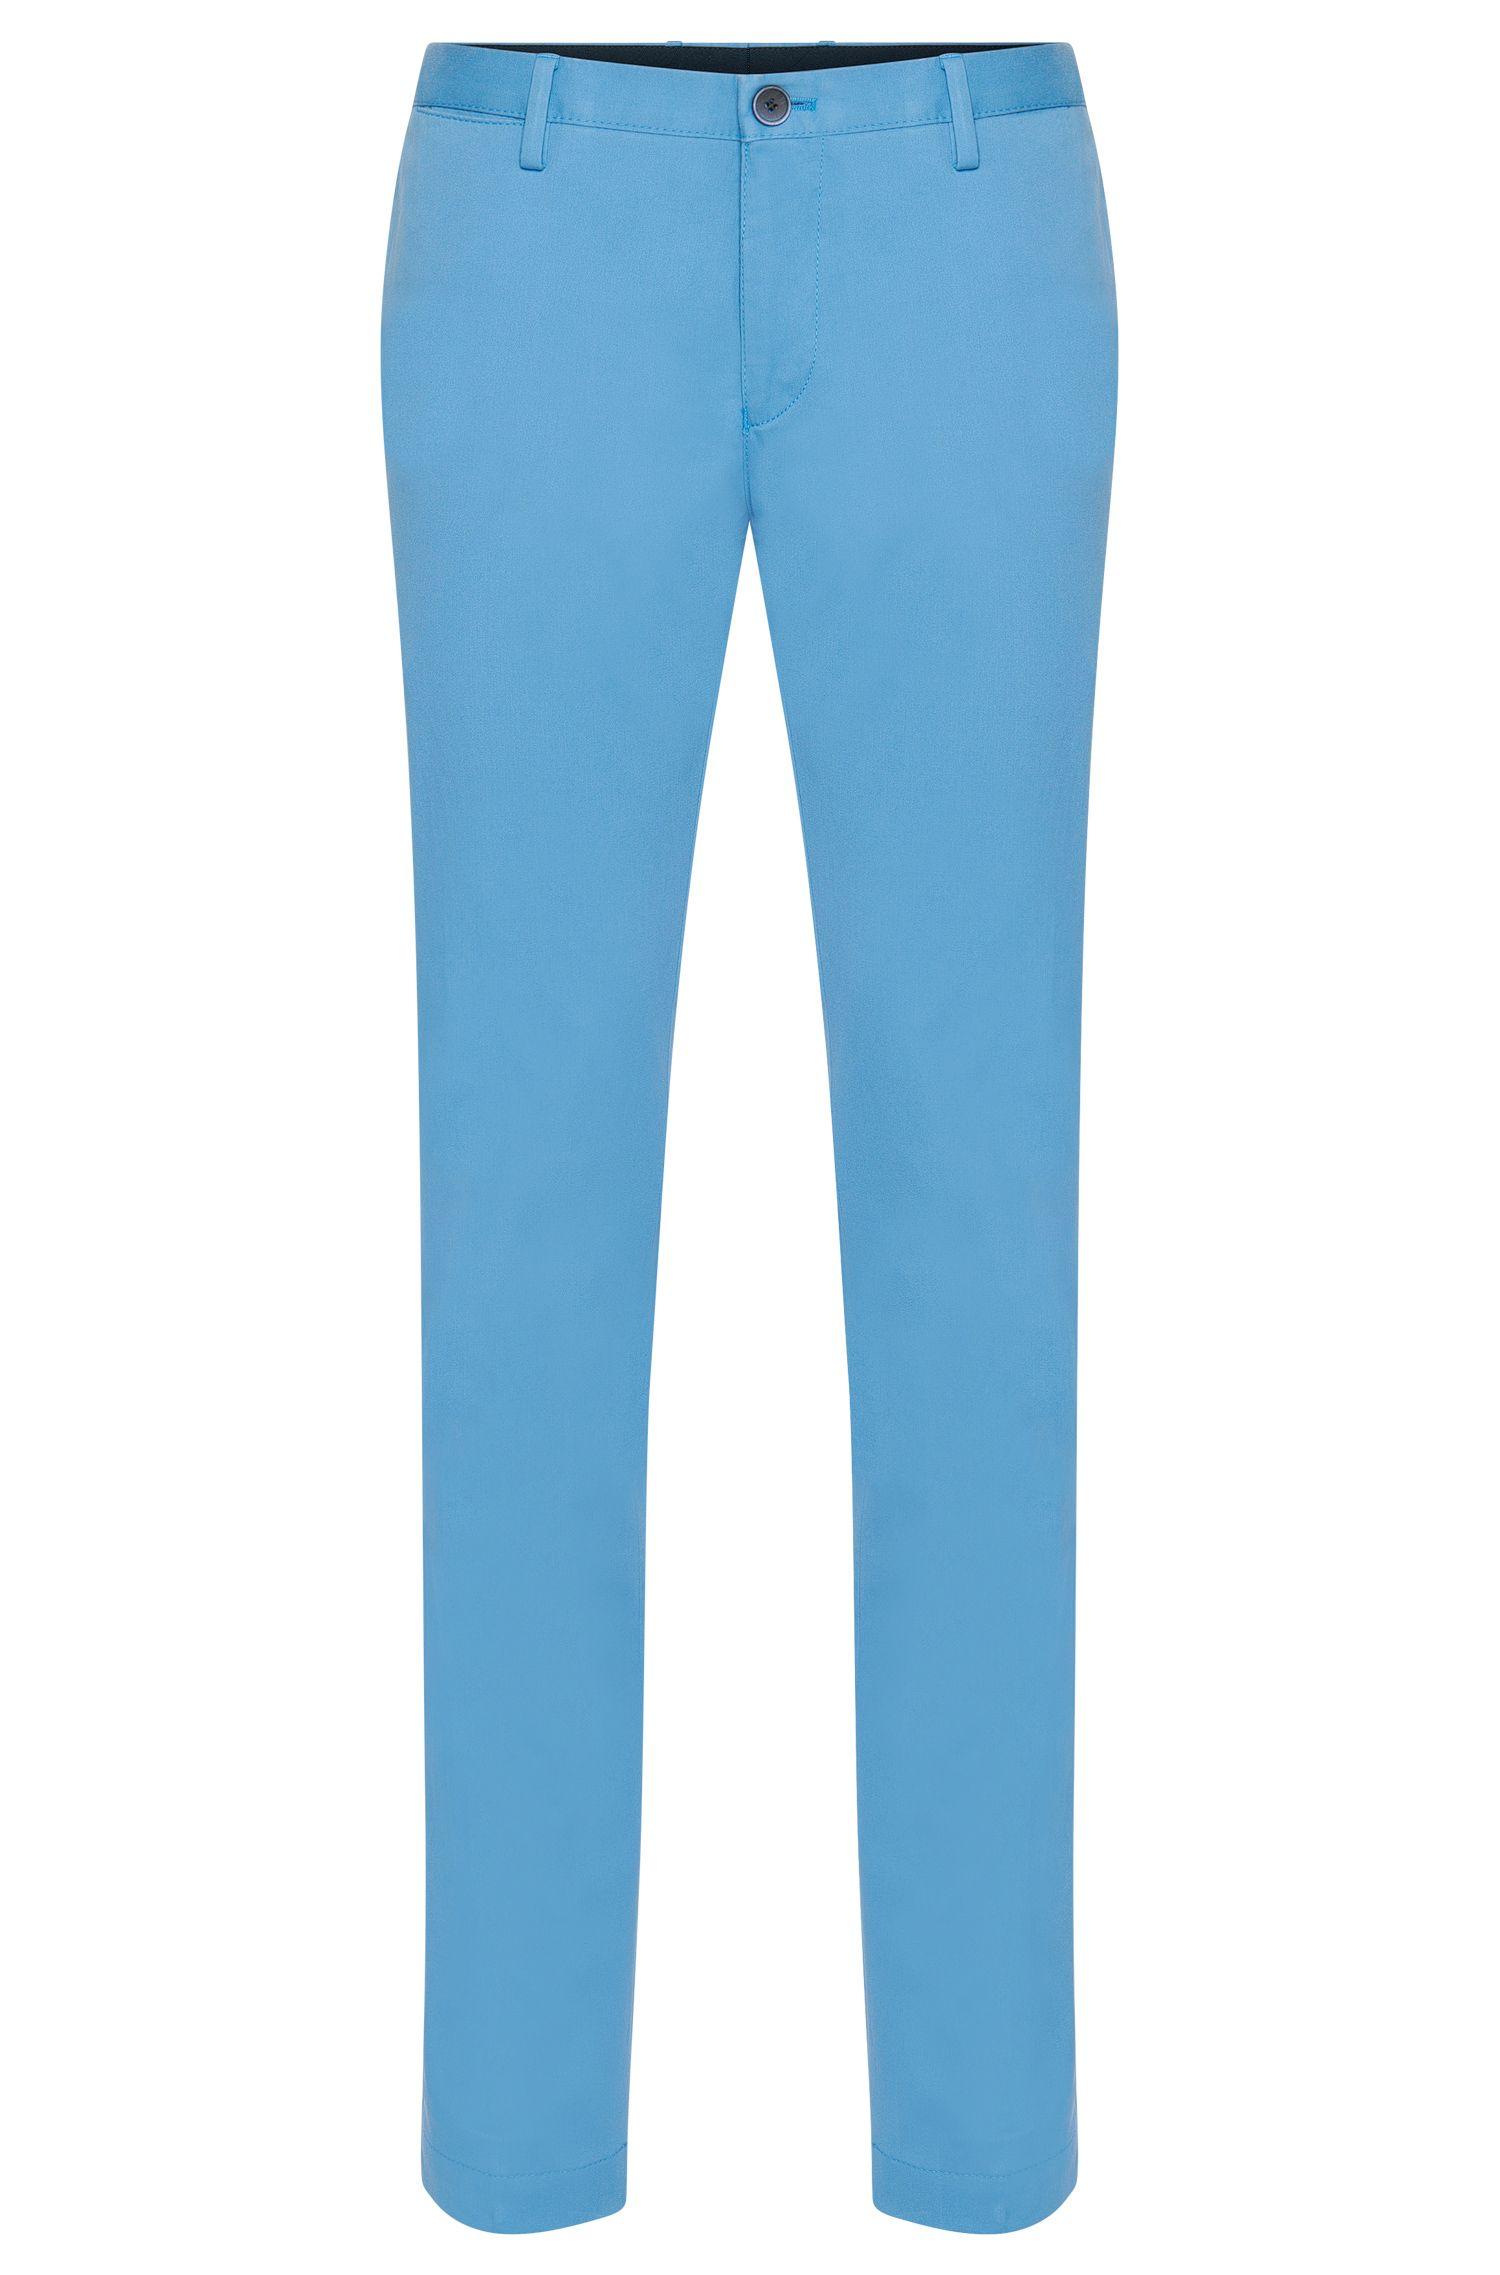 'Stanino W'   Slim Fit, Stretch Cotton Chino Pants